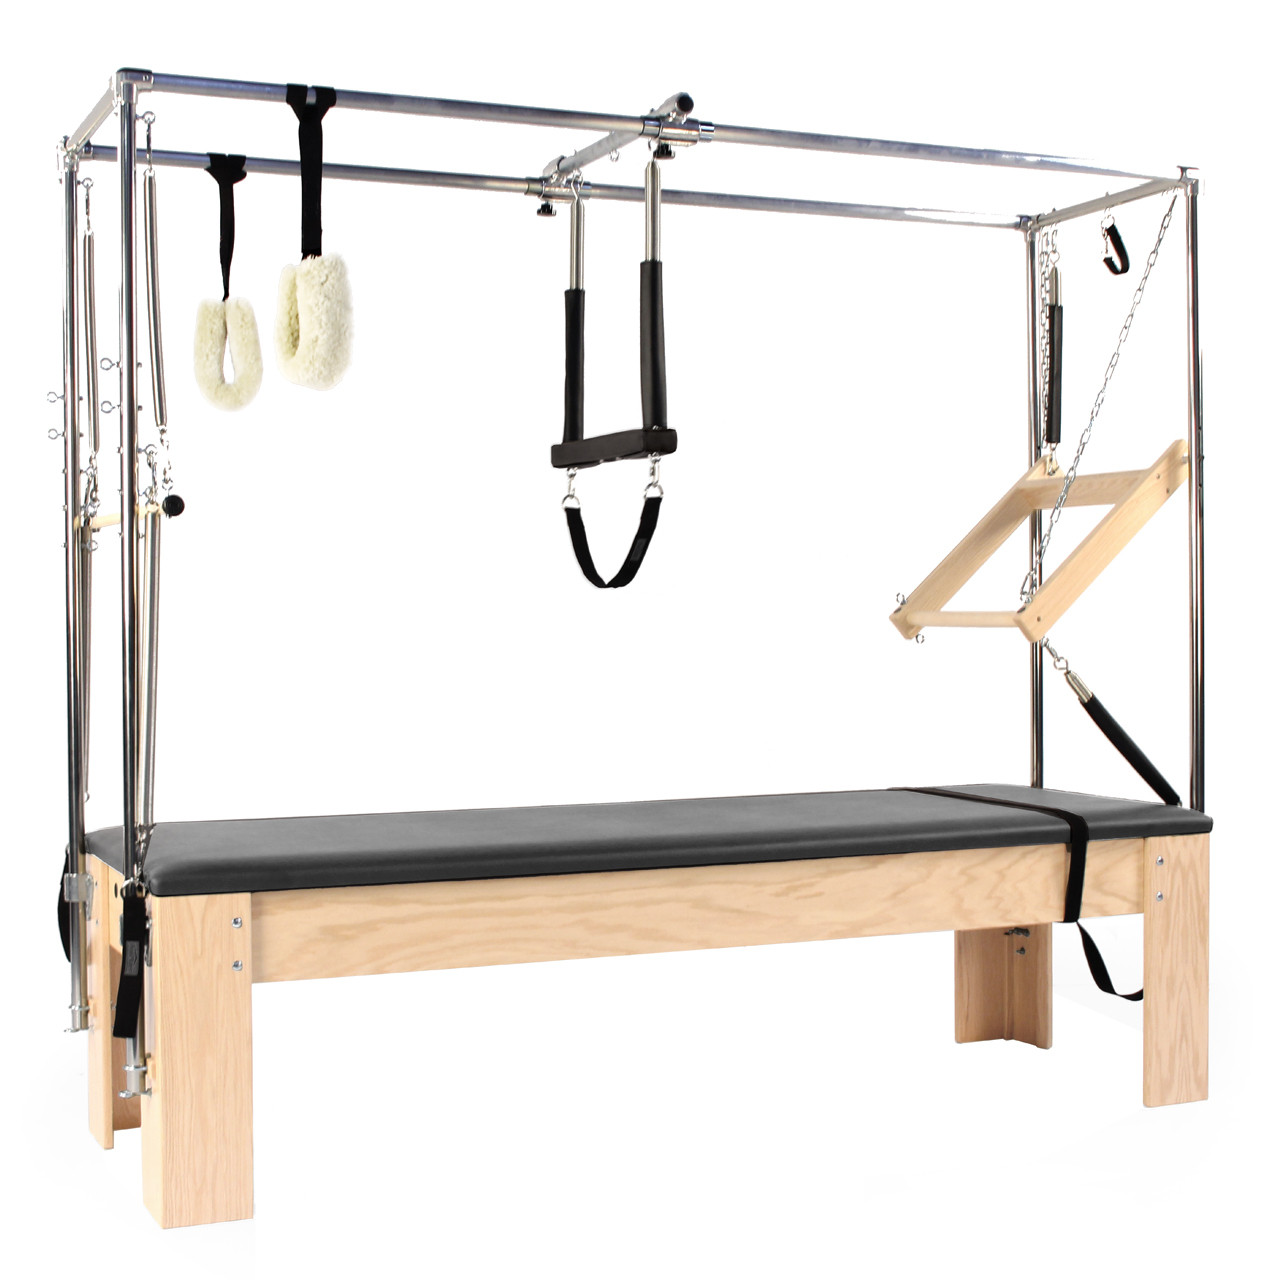 Pilates Chair For Sale: Peak Pilates®